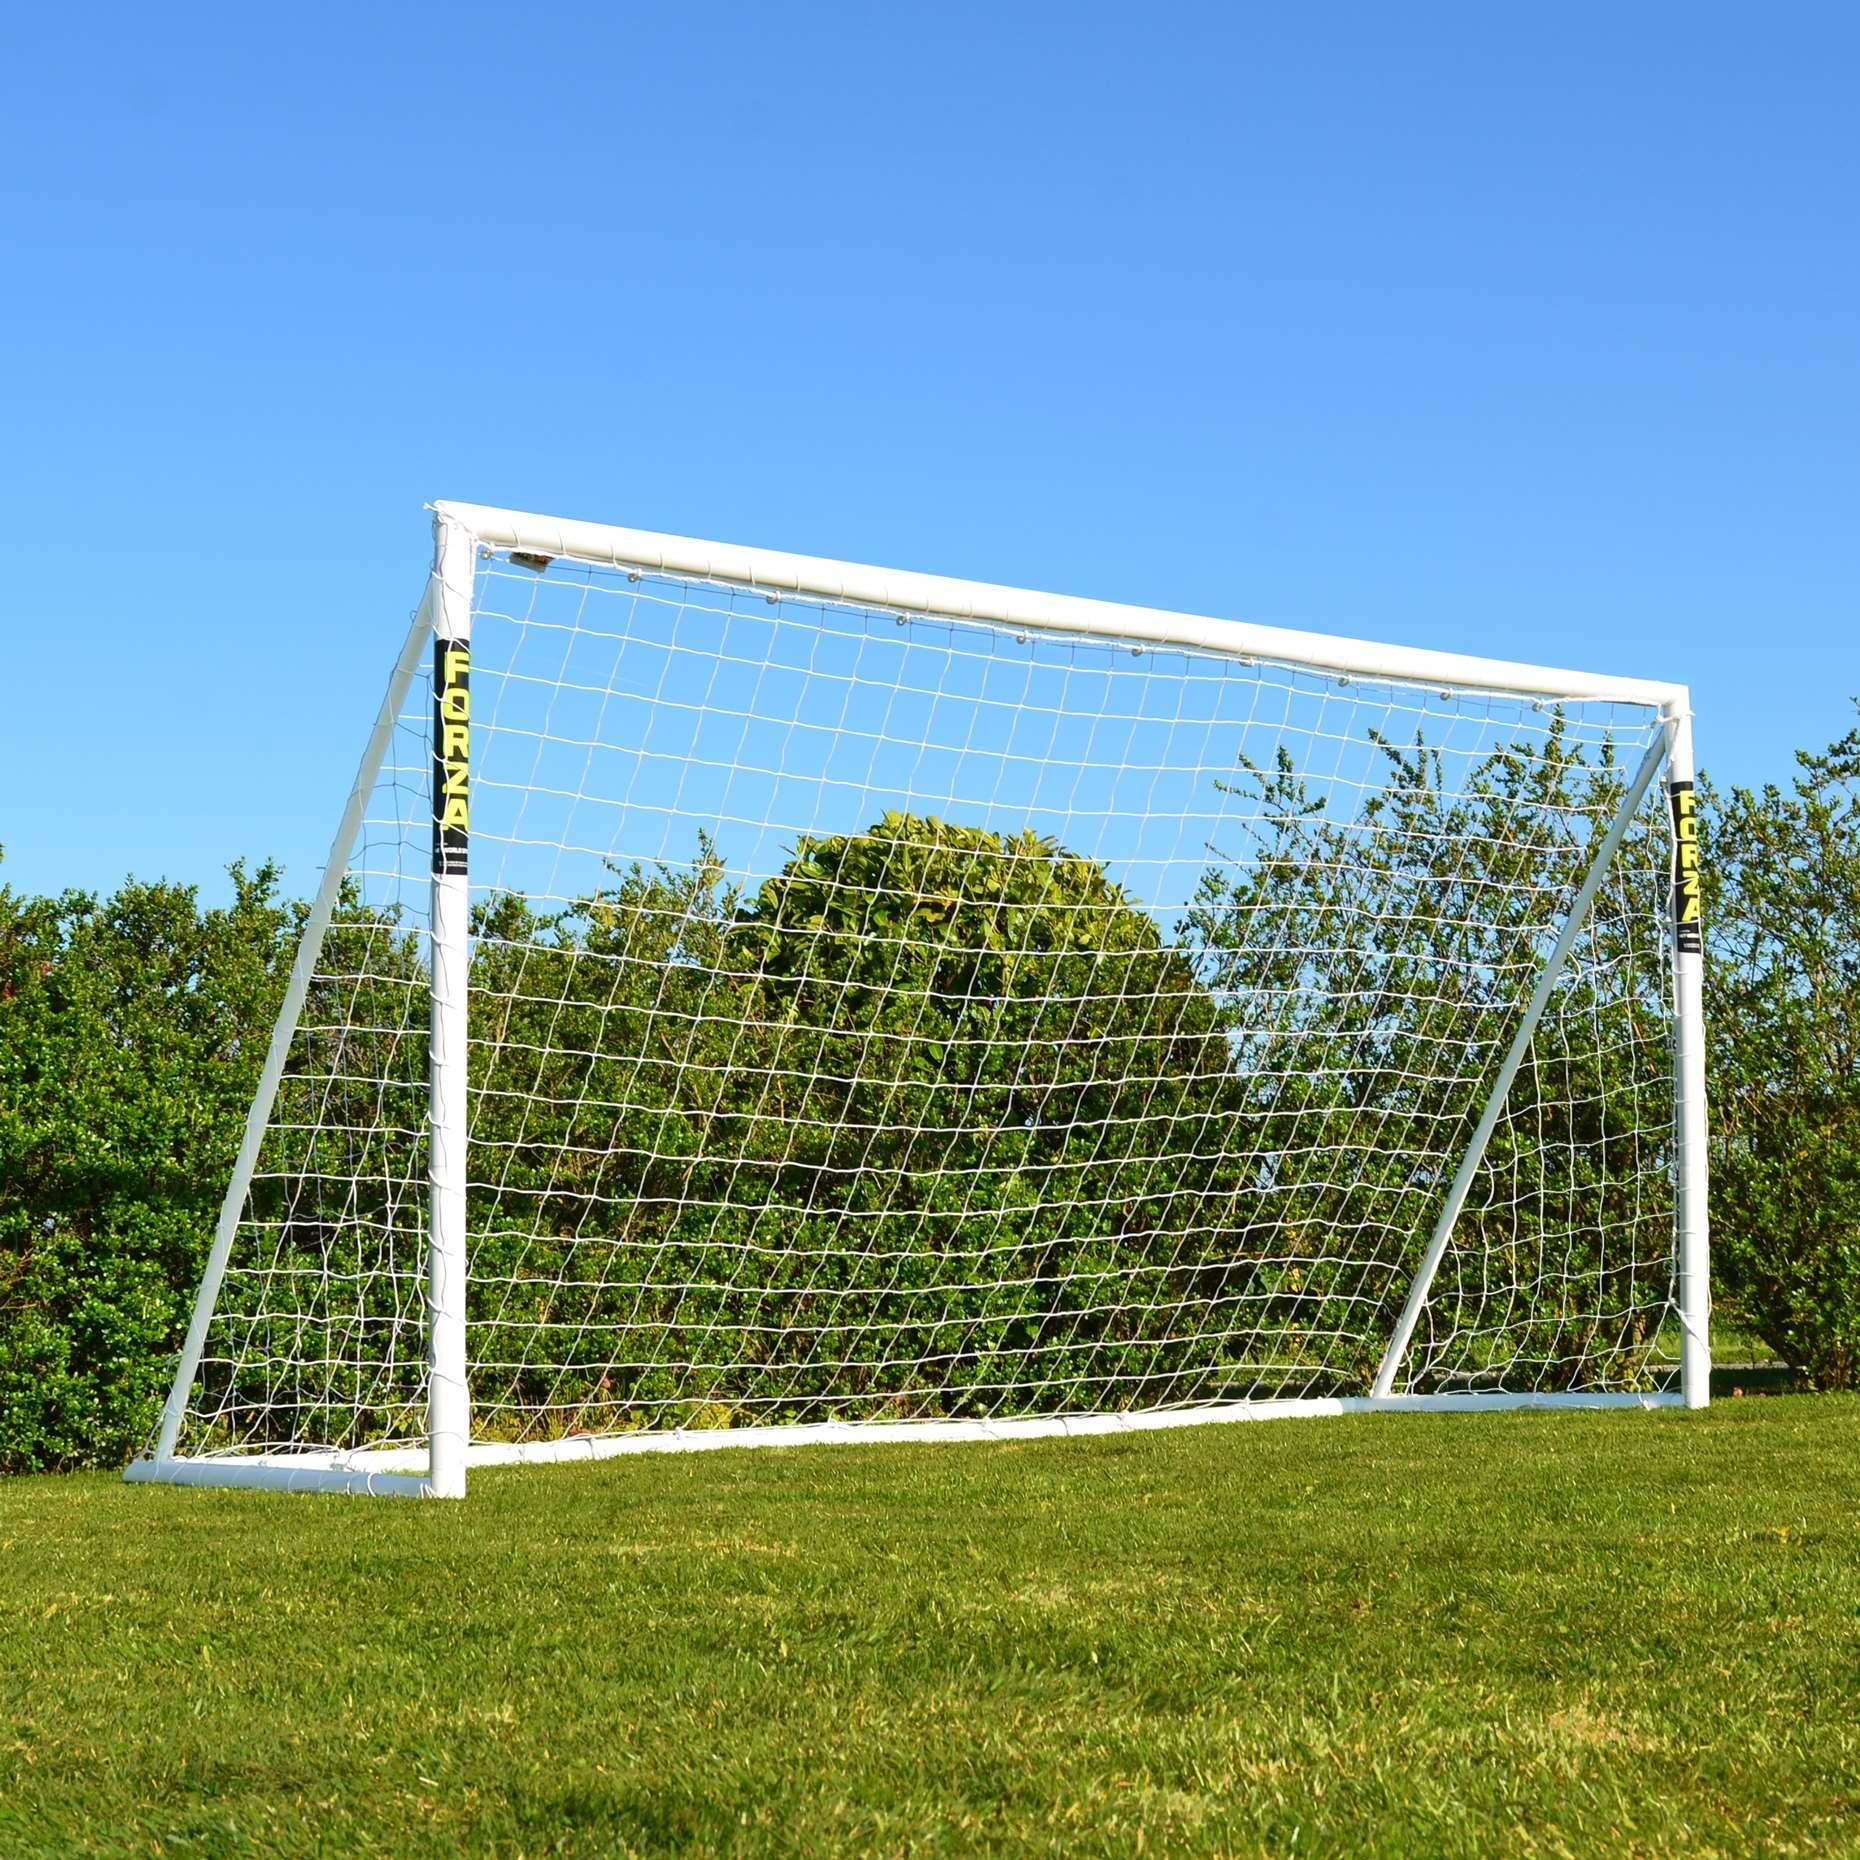 12 X 6 Forza Soccer Goal Post Soccer Goals Net World